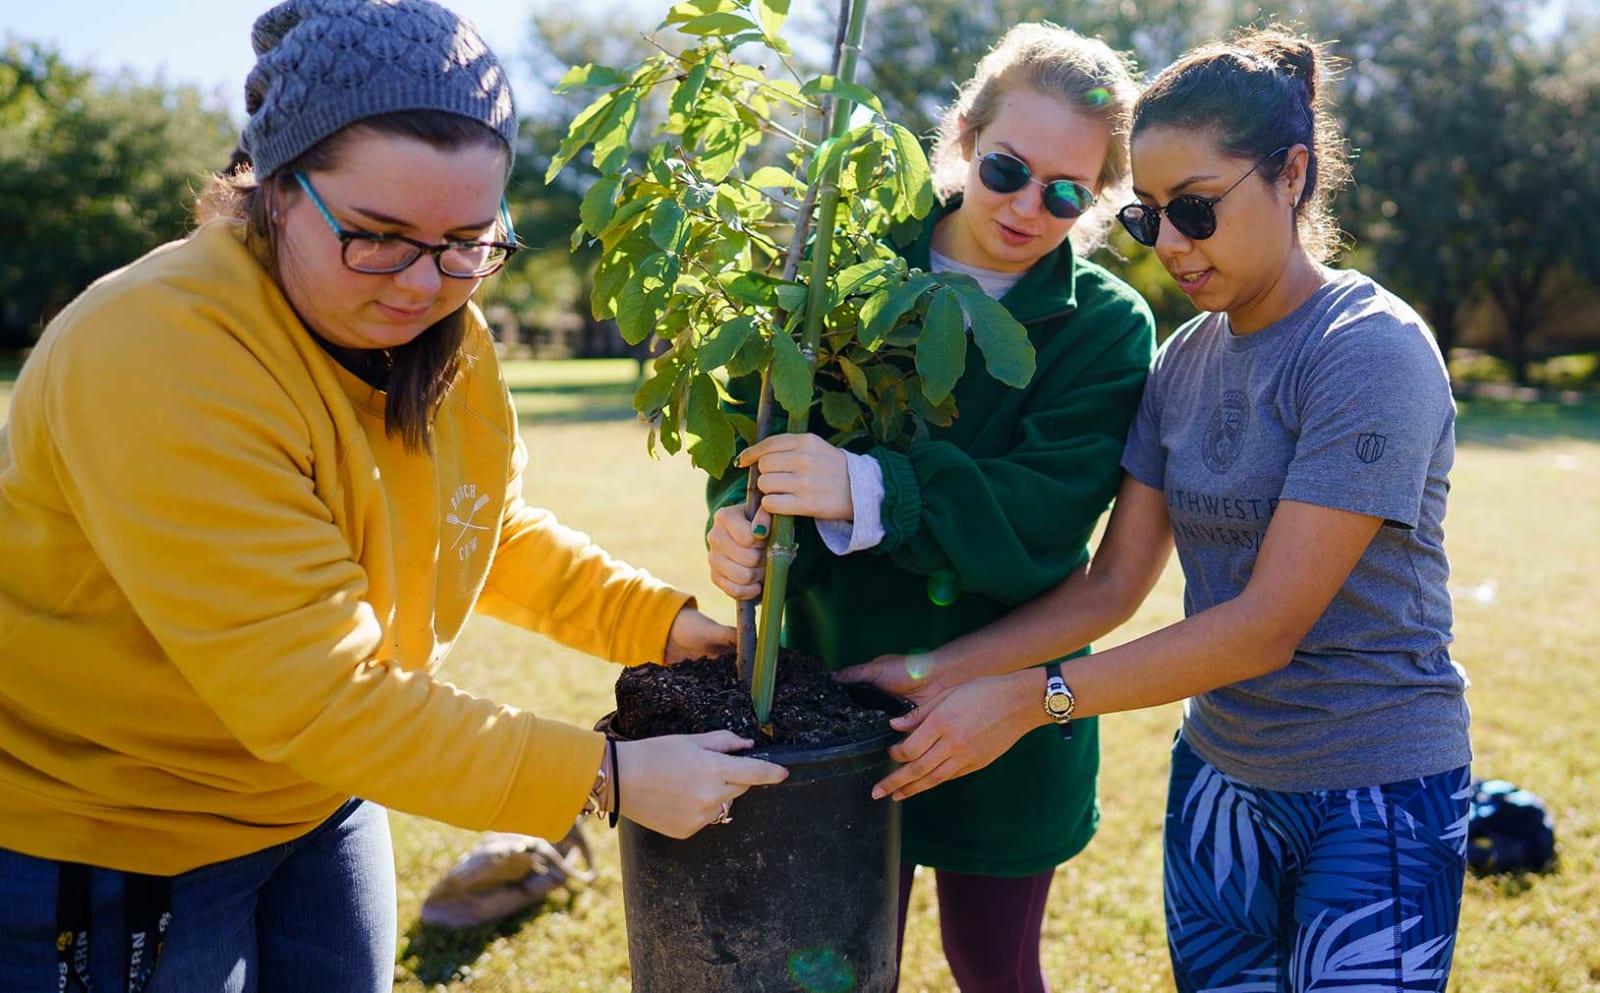 Southwestern University students in the garden